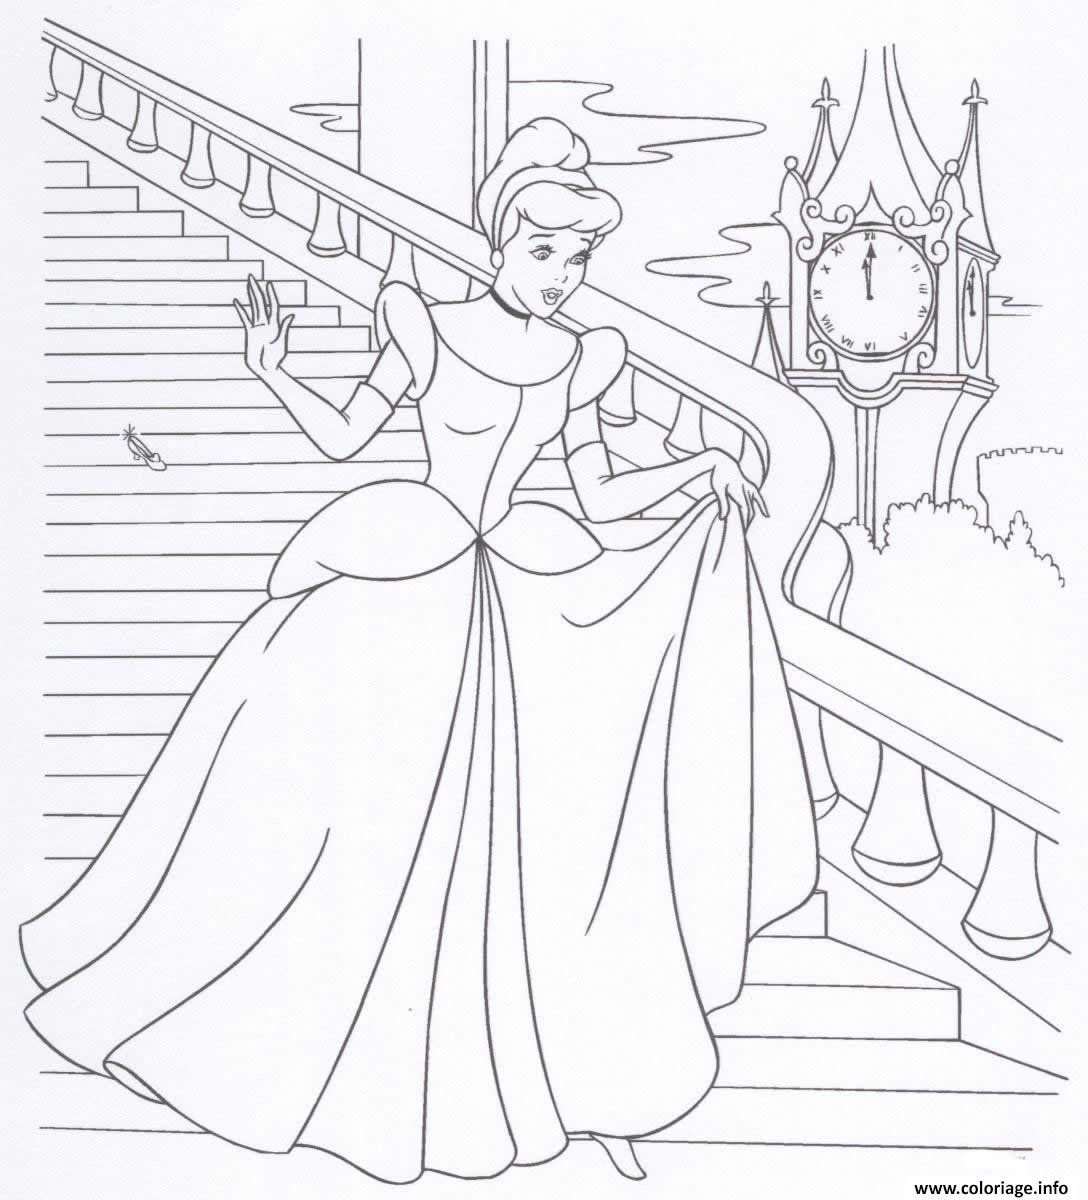 Coloriage Cendrillon Princesse 18 Jecoloriecom